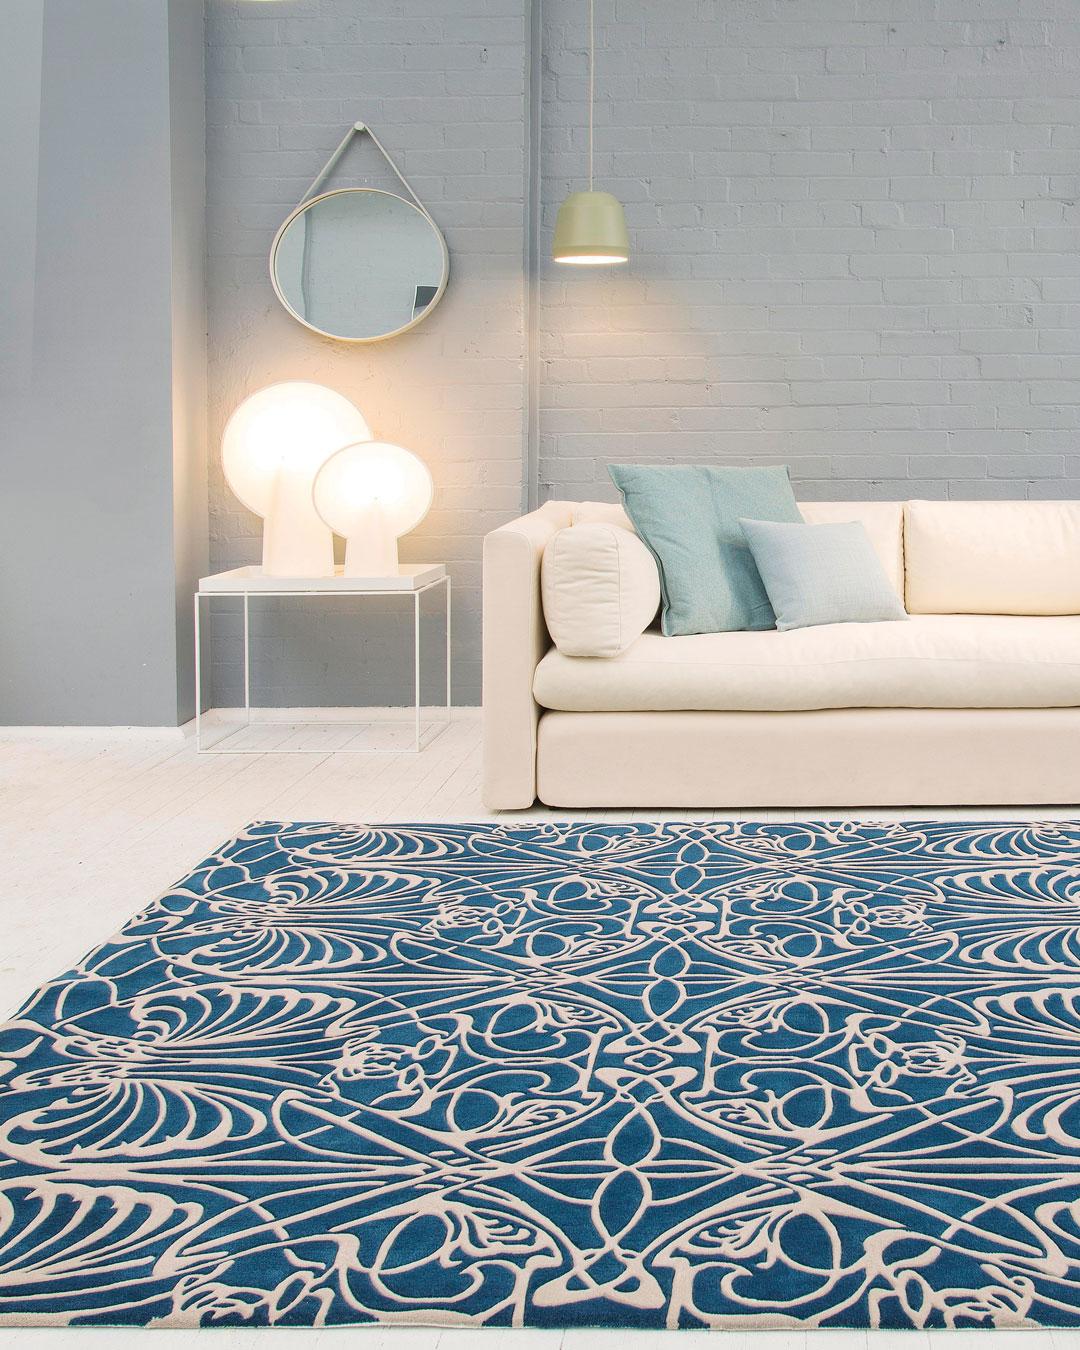 Styled image of art nouveau Metropolitan rug in blue colour